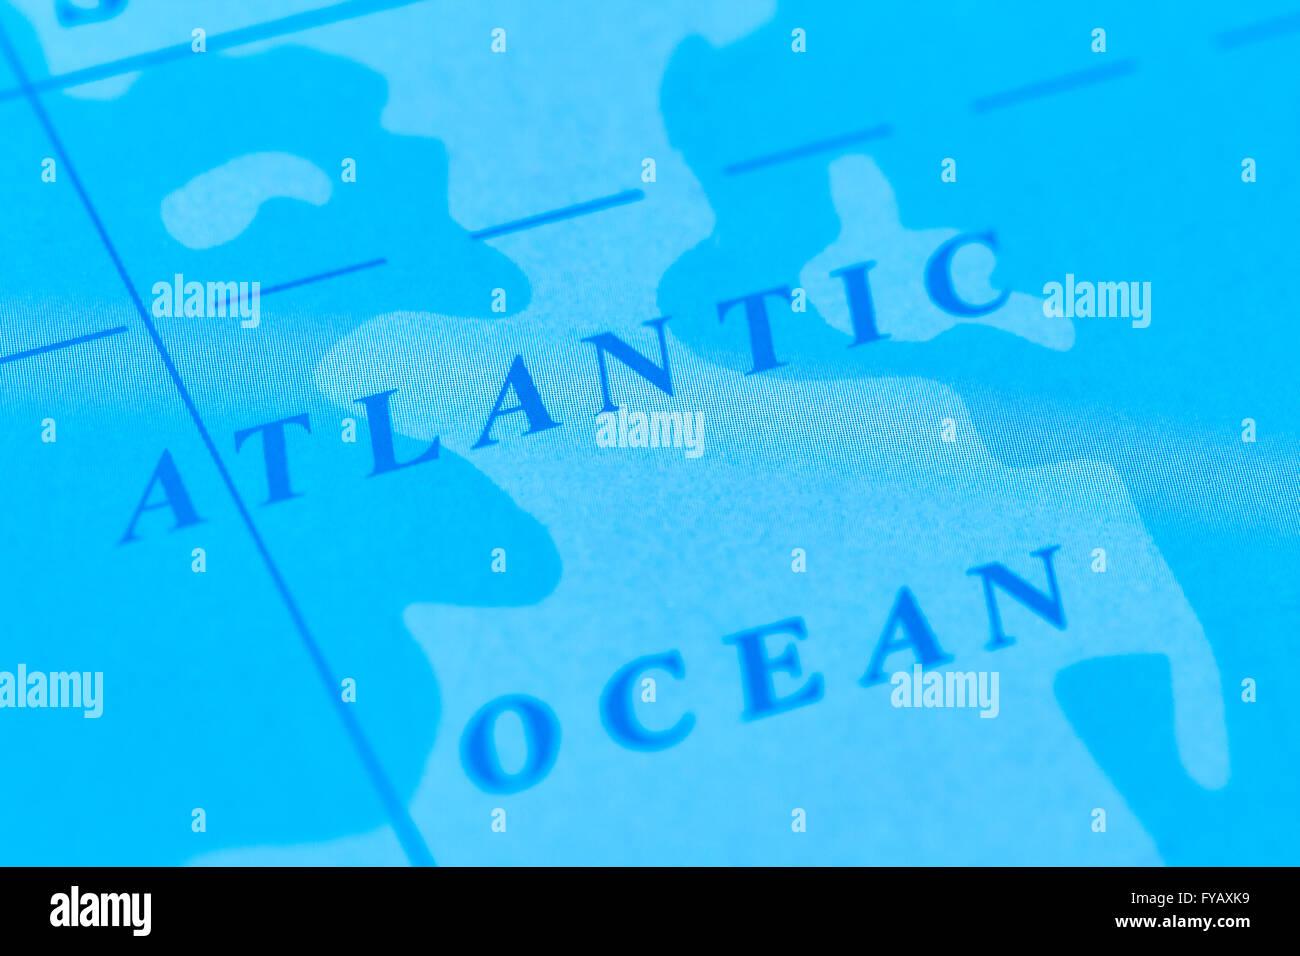 Atlantic ocean map stock photos atlantic ocean map stock images atlantic ocean on the world map stock image gumiabroncs Choice Image